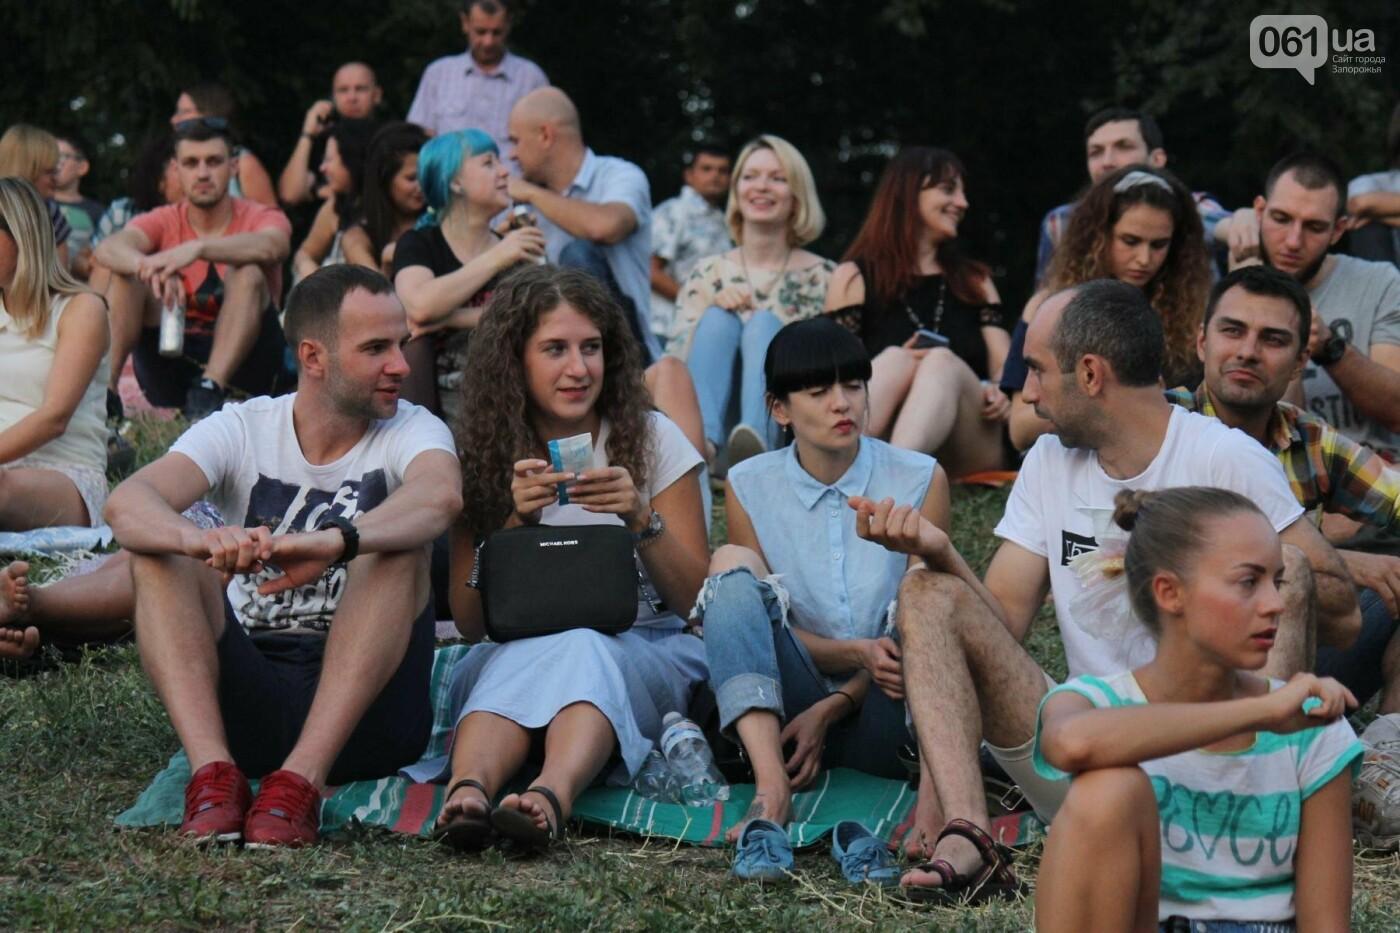 Найди себя: 50 портретов посетителей фестиваля Khortytsia Freedom, – ФОТОРЕПОРТАЖ, фото-45